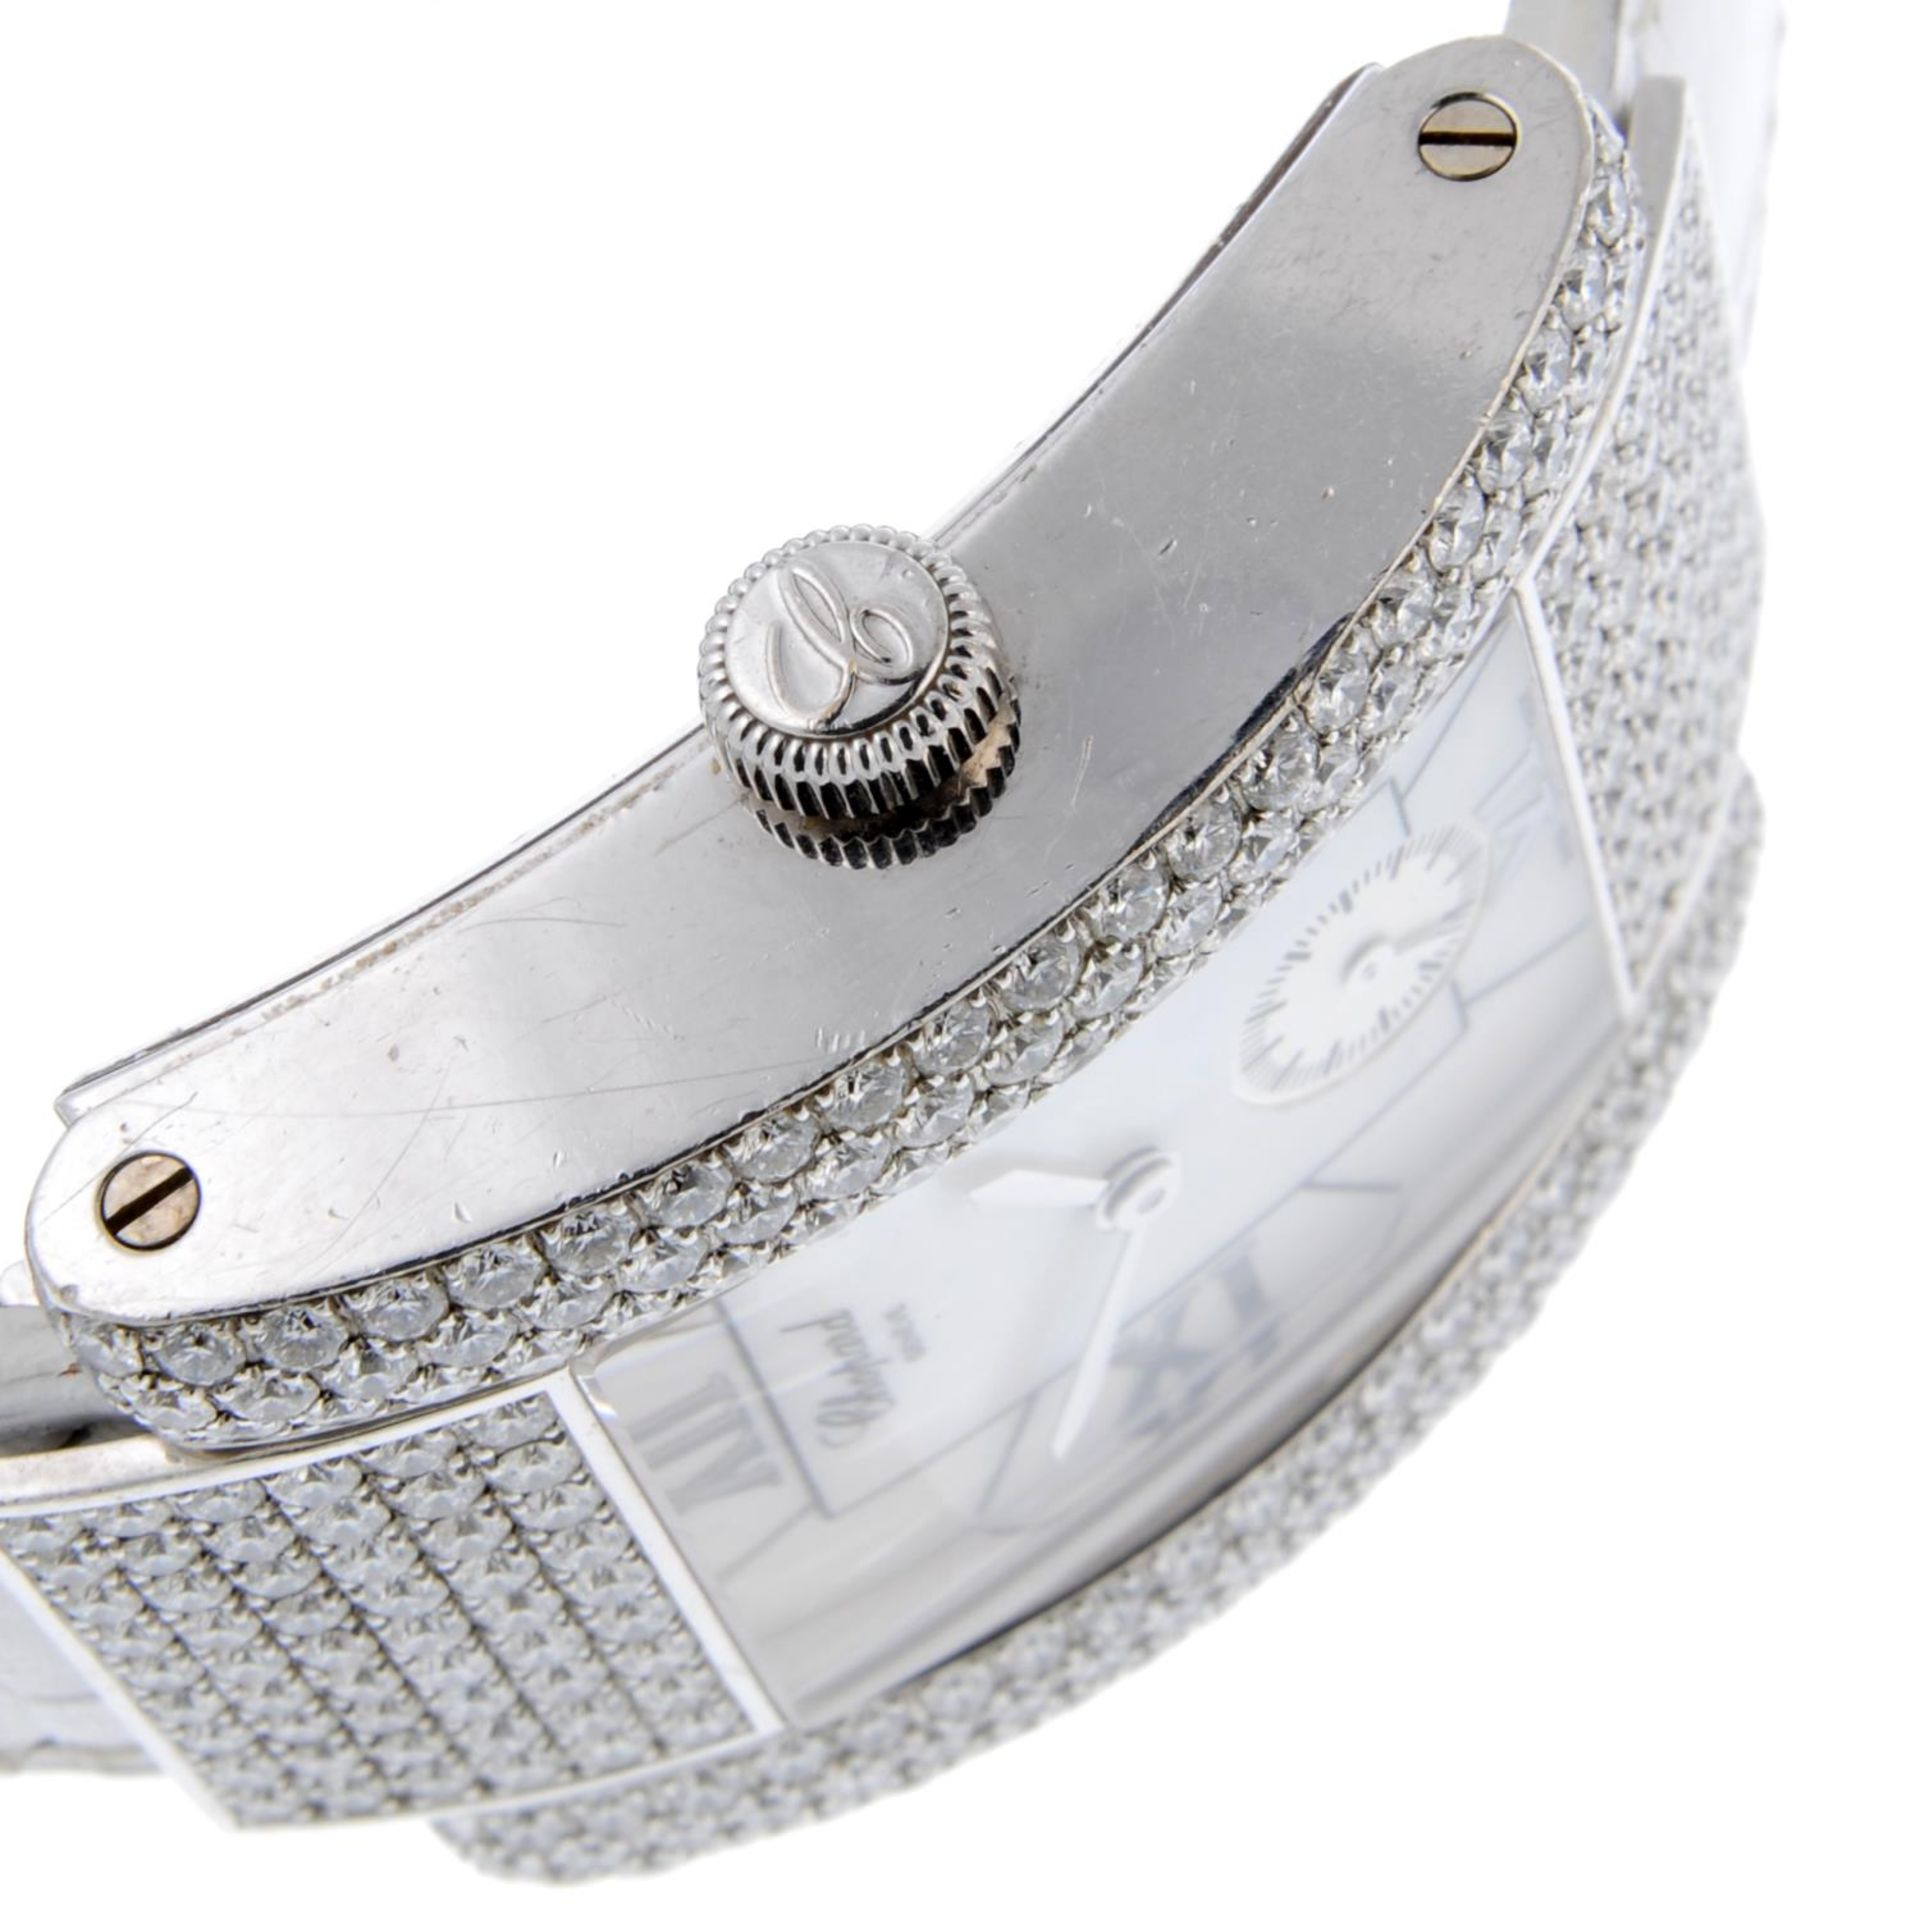 CHOPARD - a La Strada wrist watch. - Bild 4 aus 5